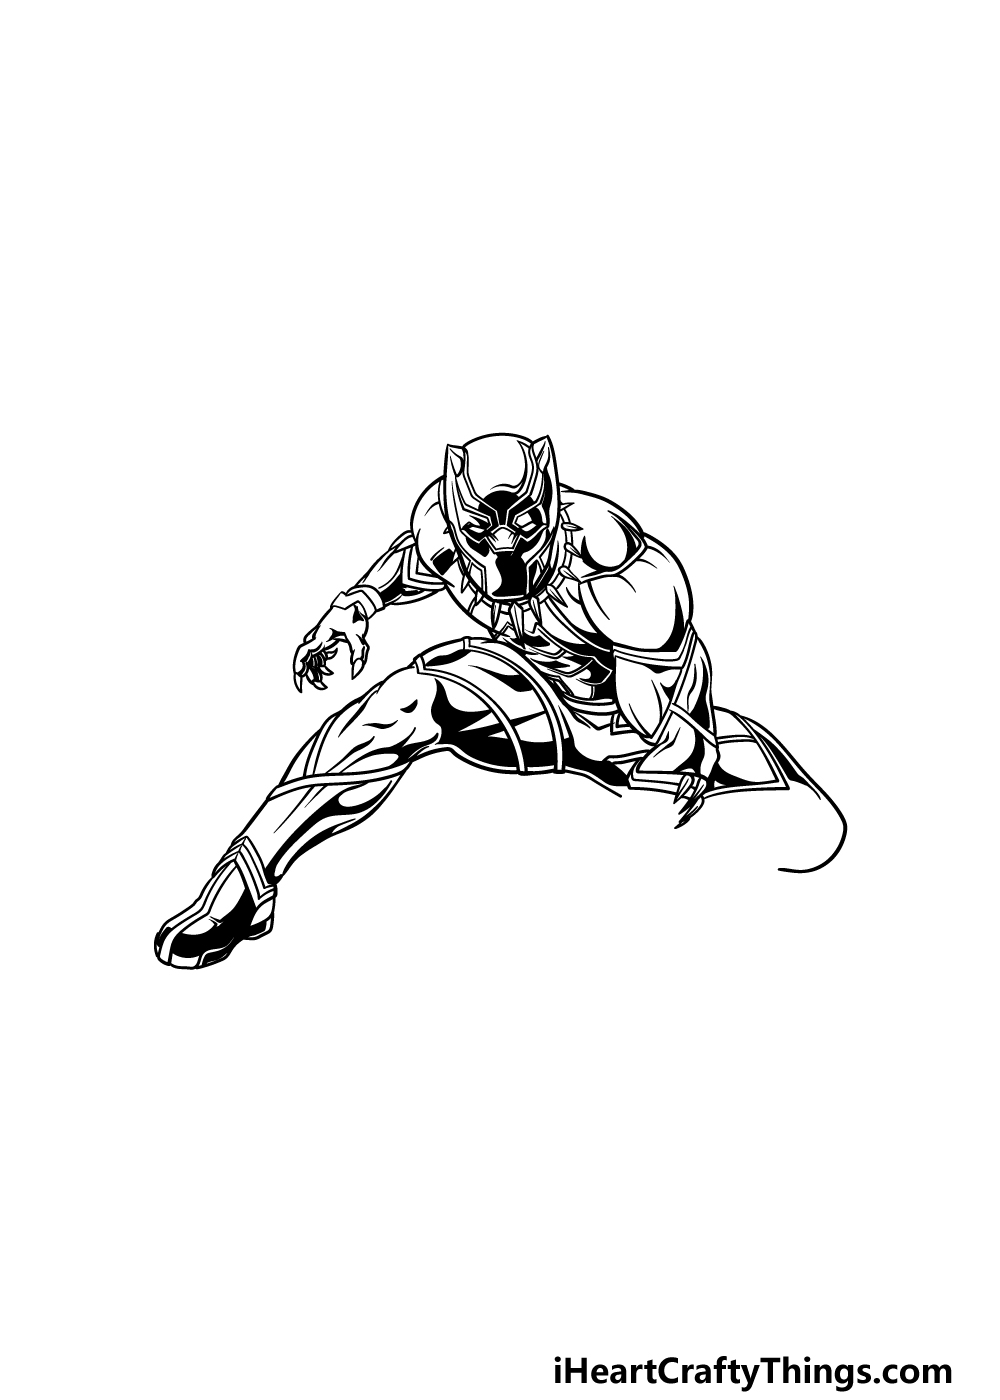 drawing Black Panther step 4